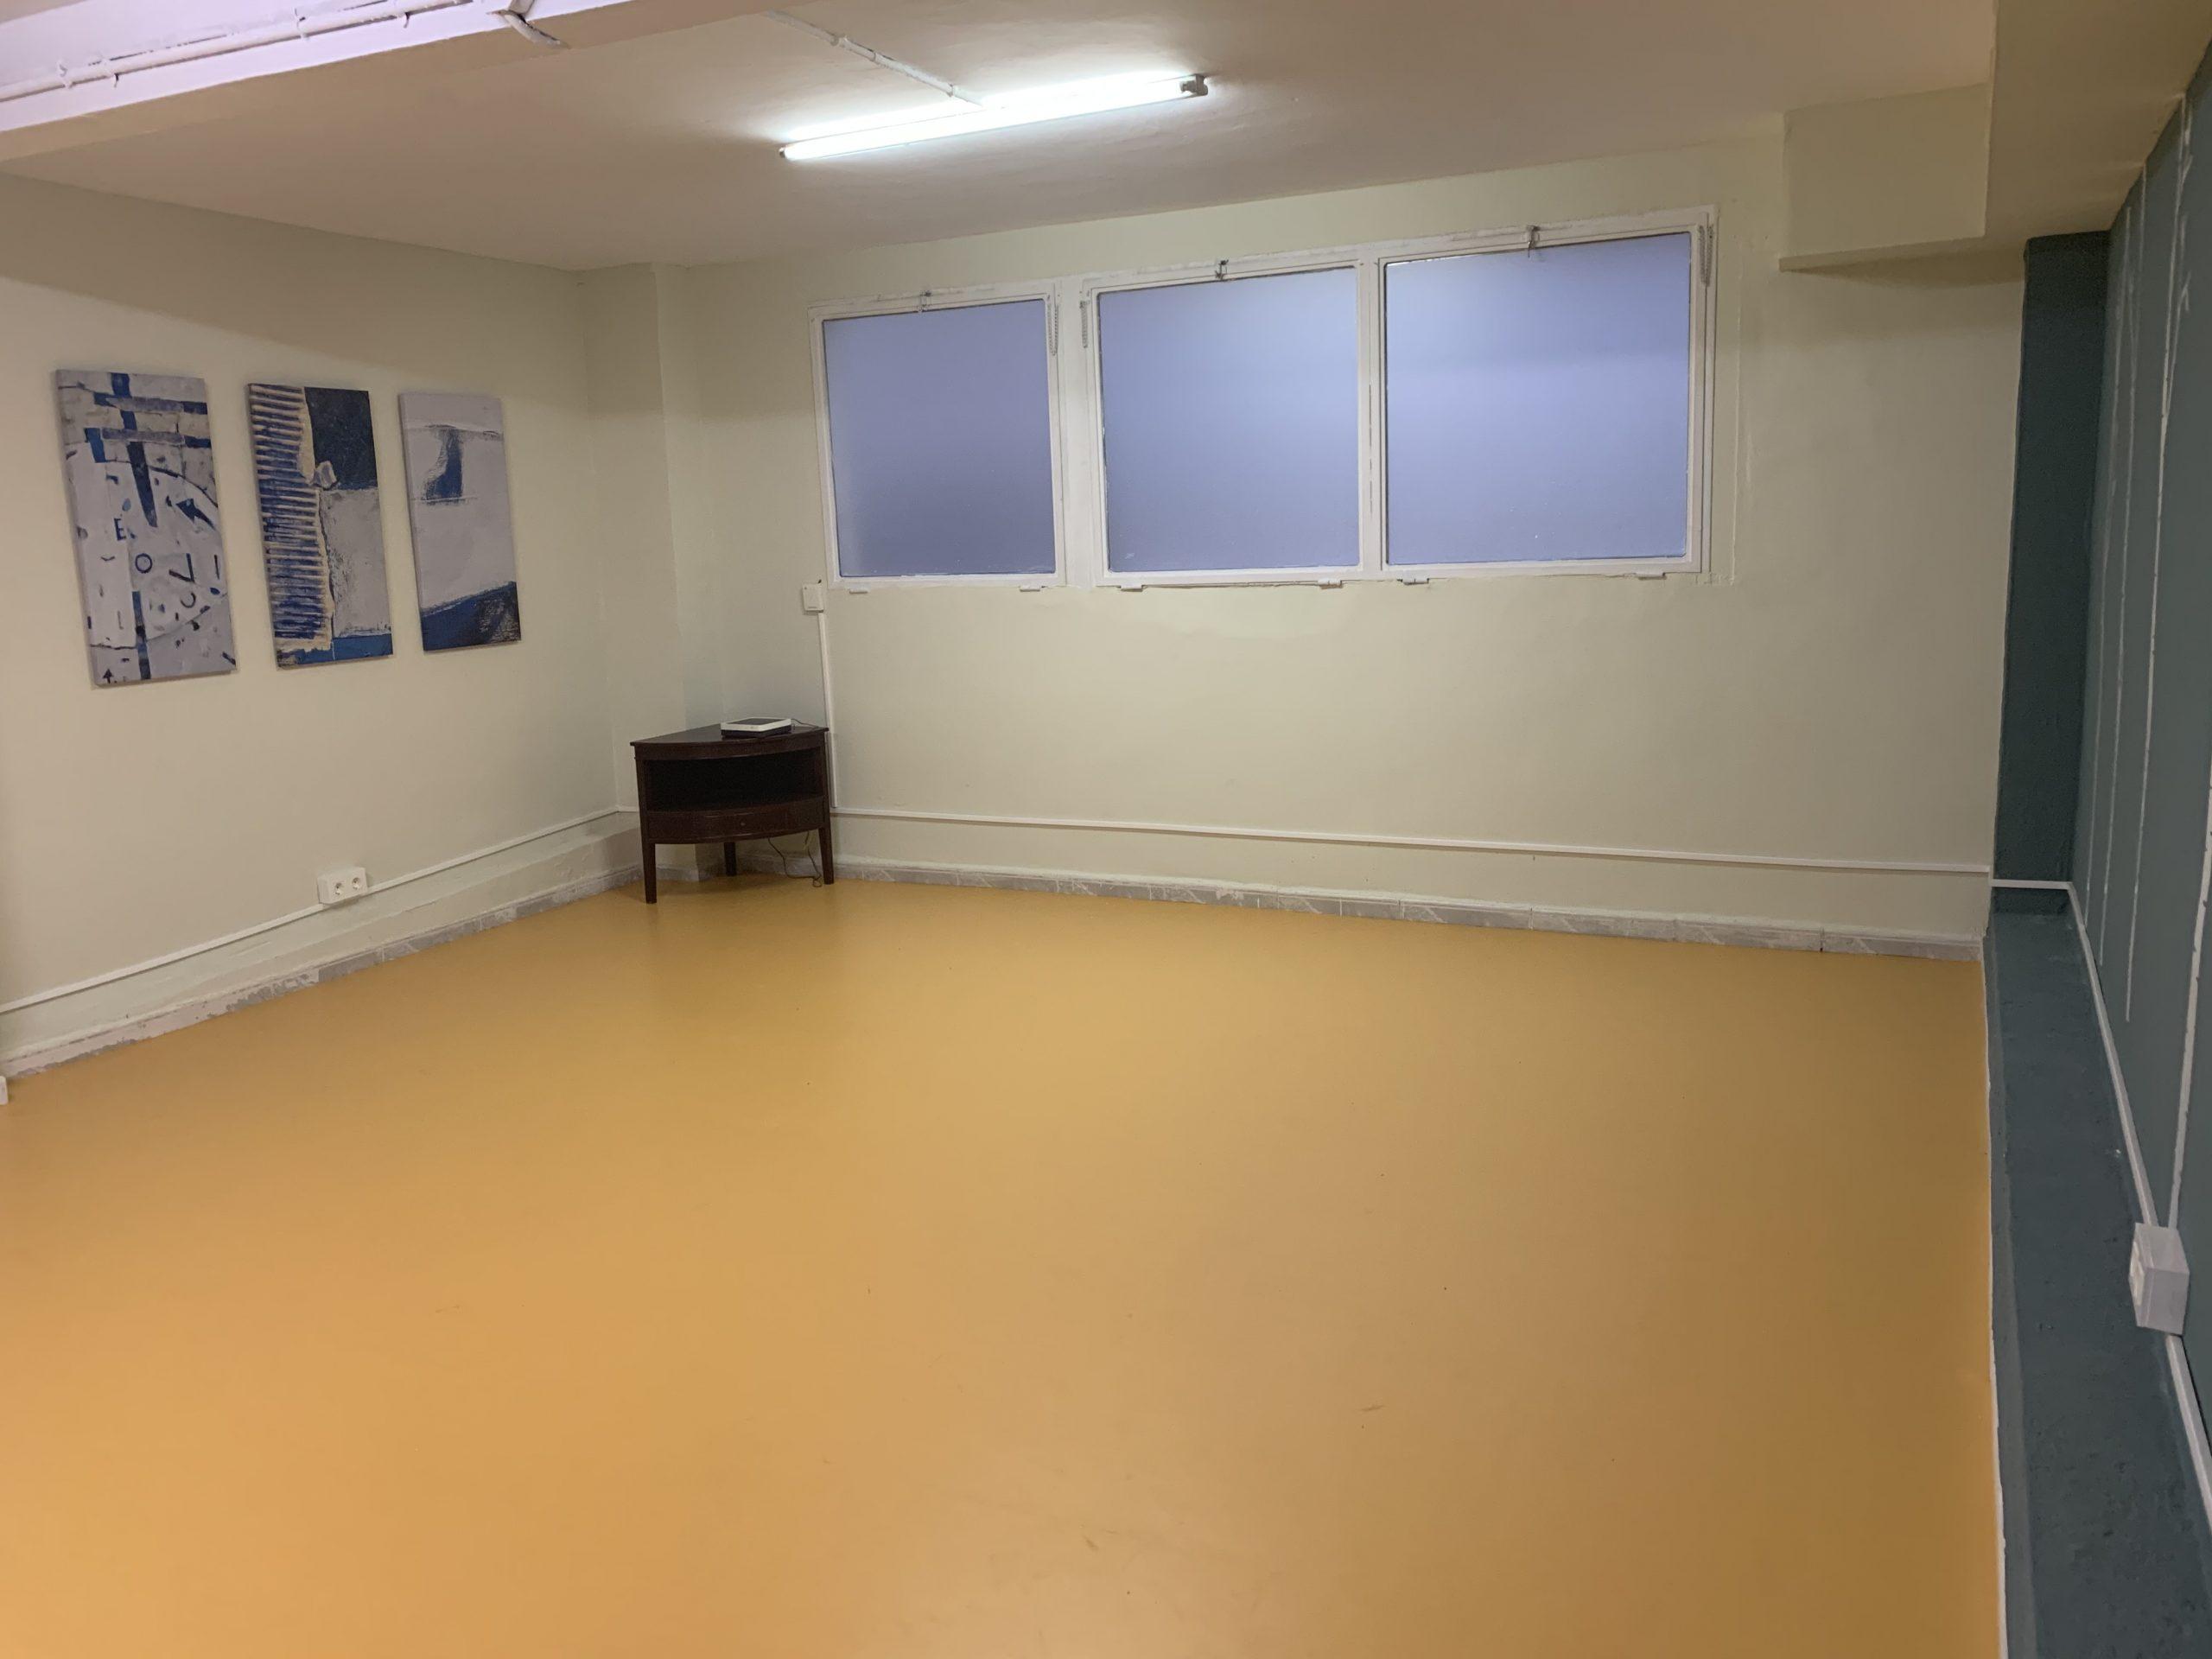 Sala Polivalente - Tempo Musical